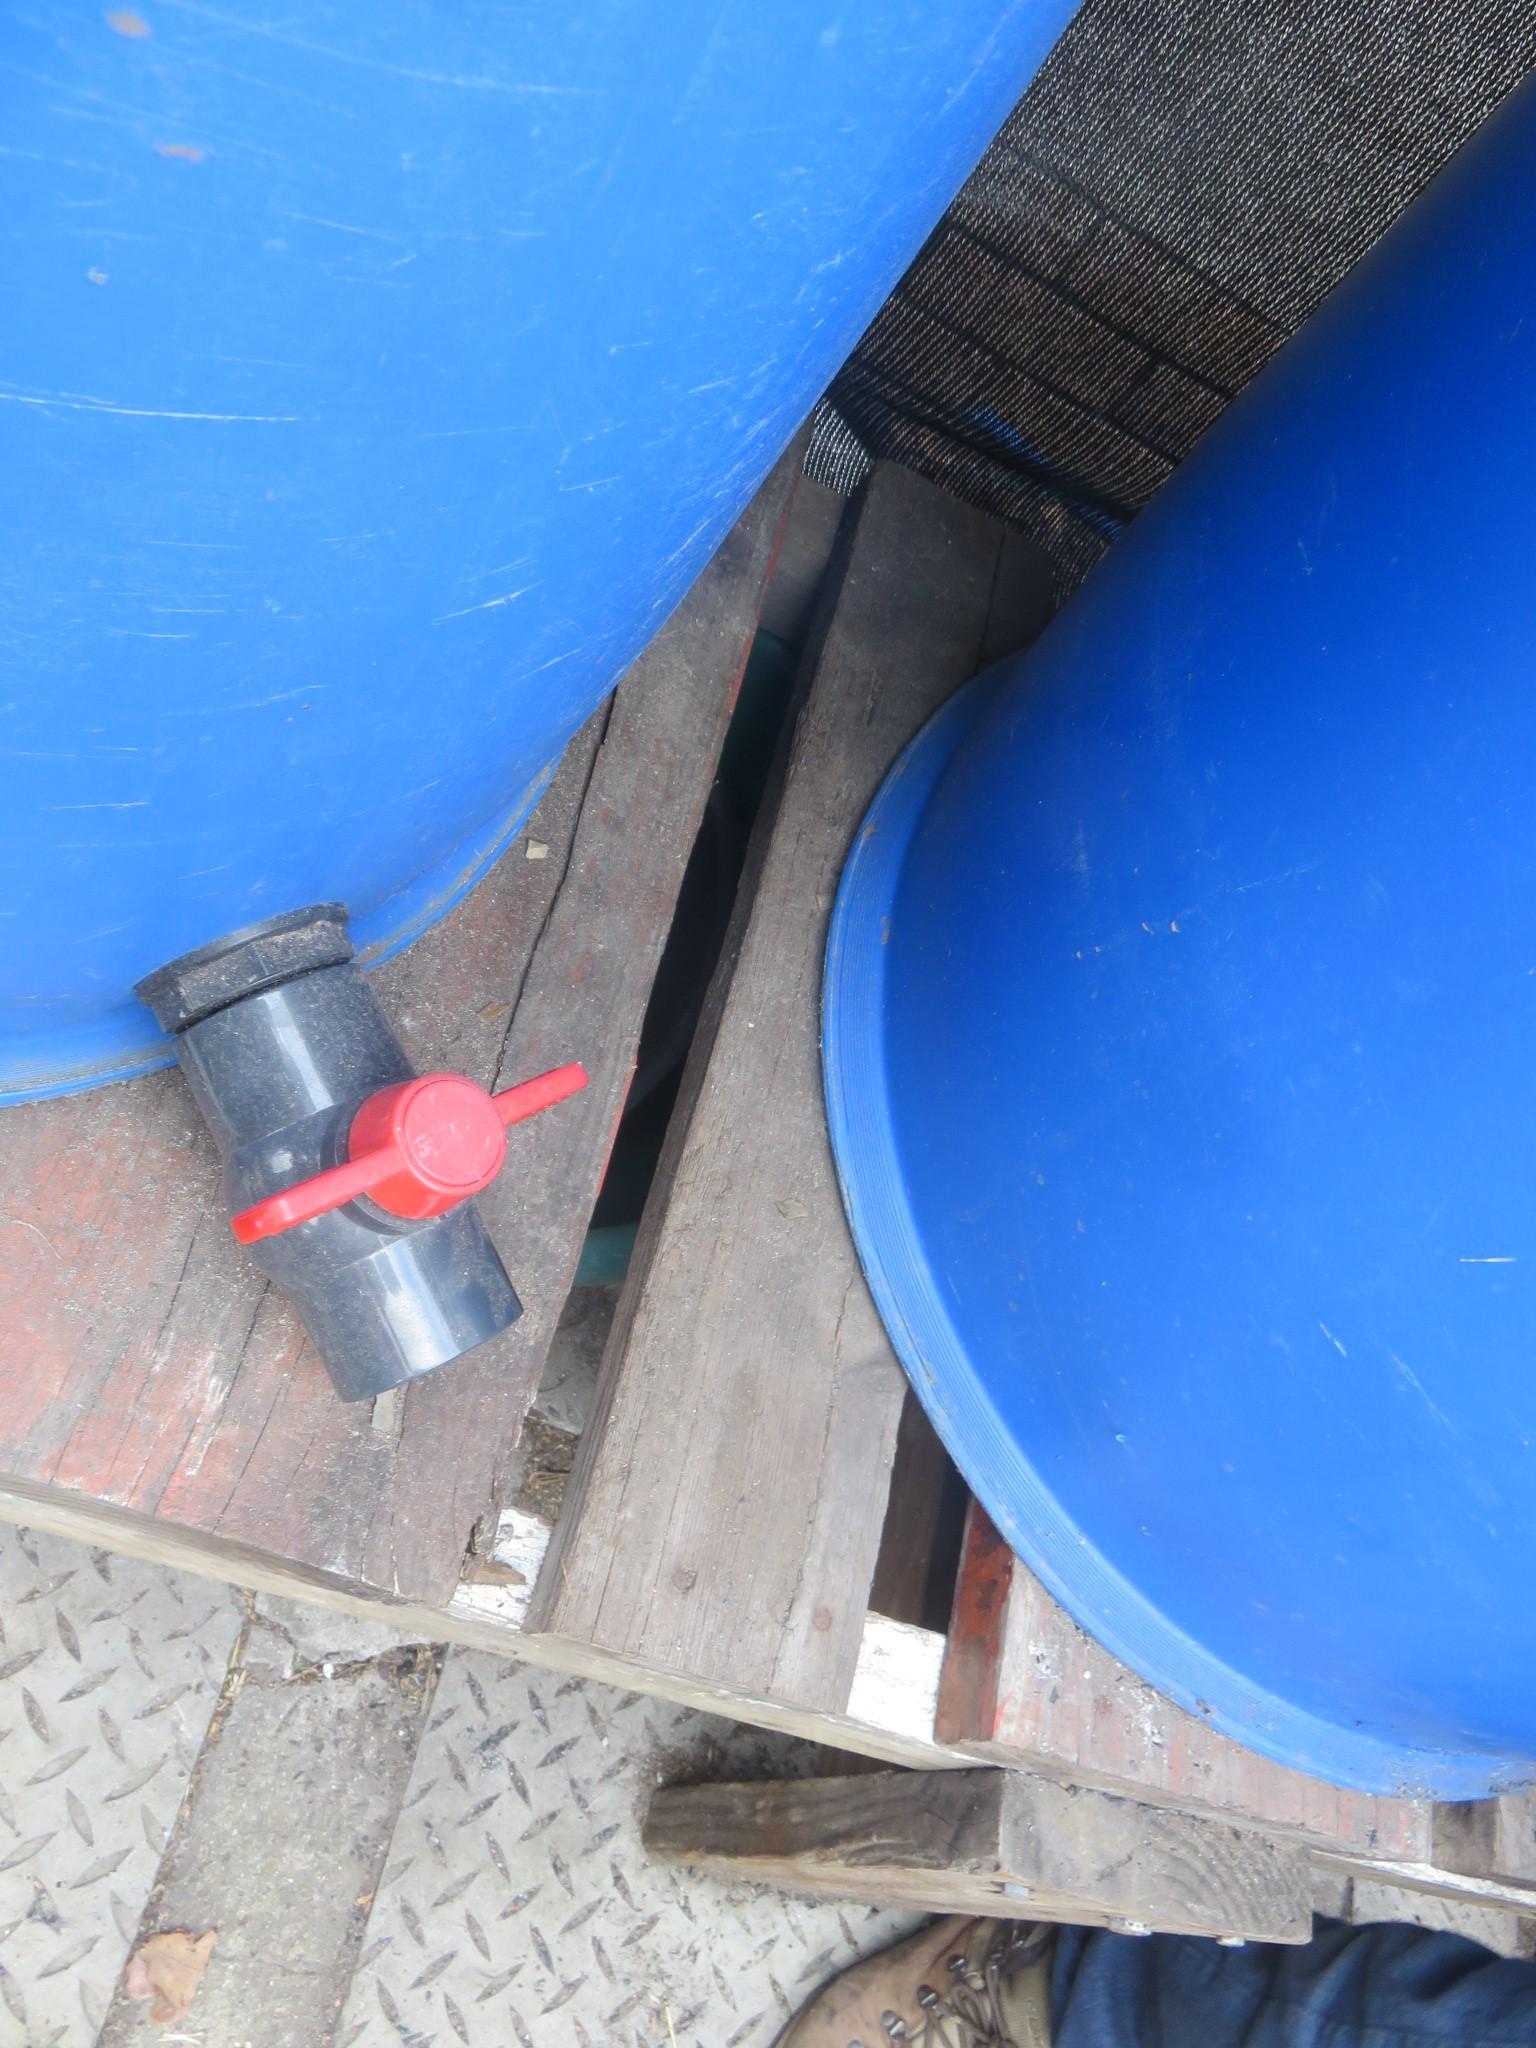 flushing valve